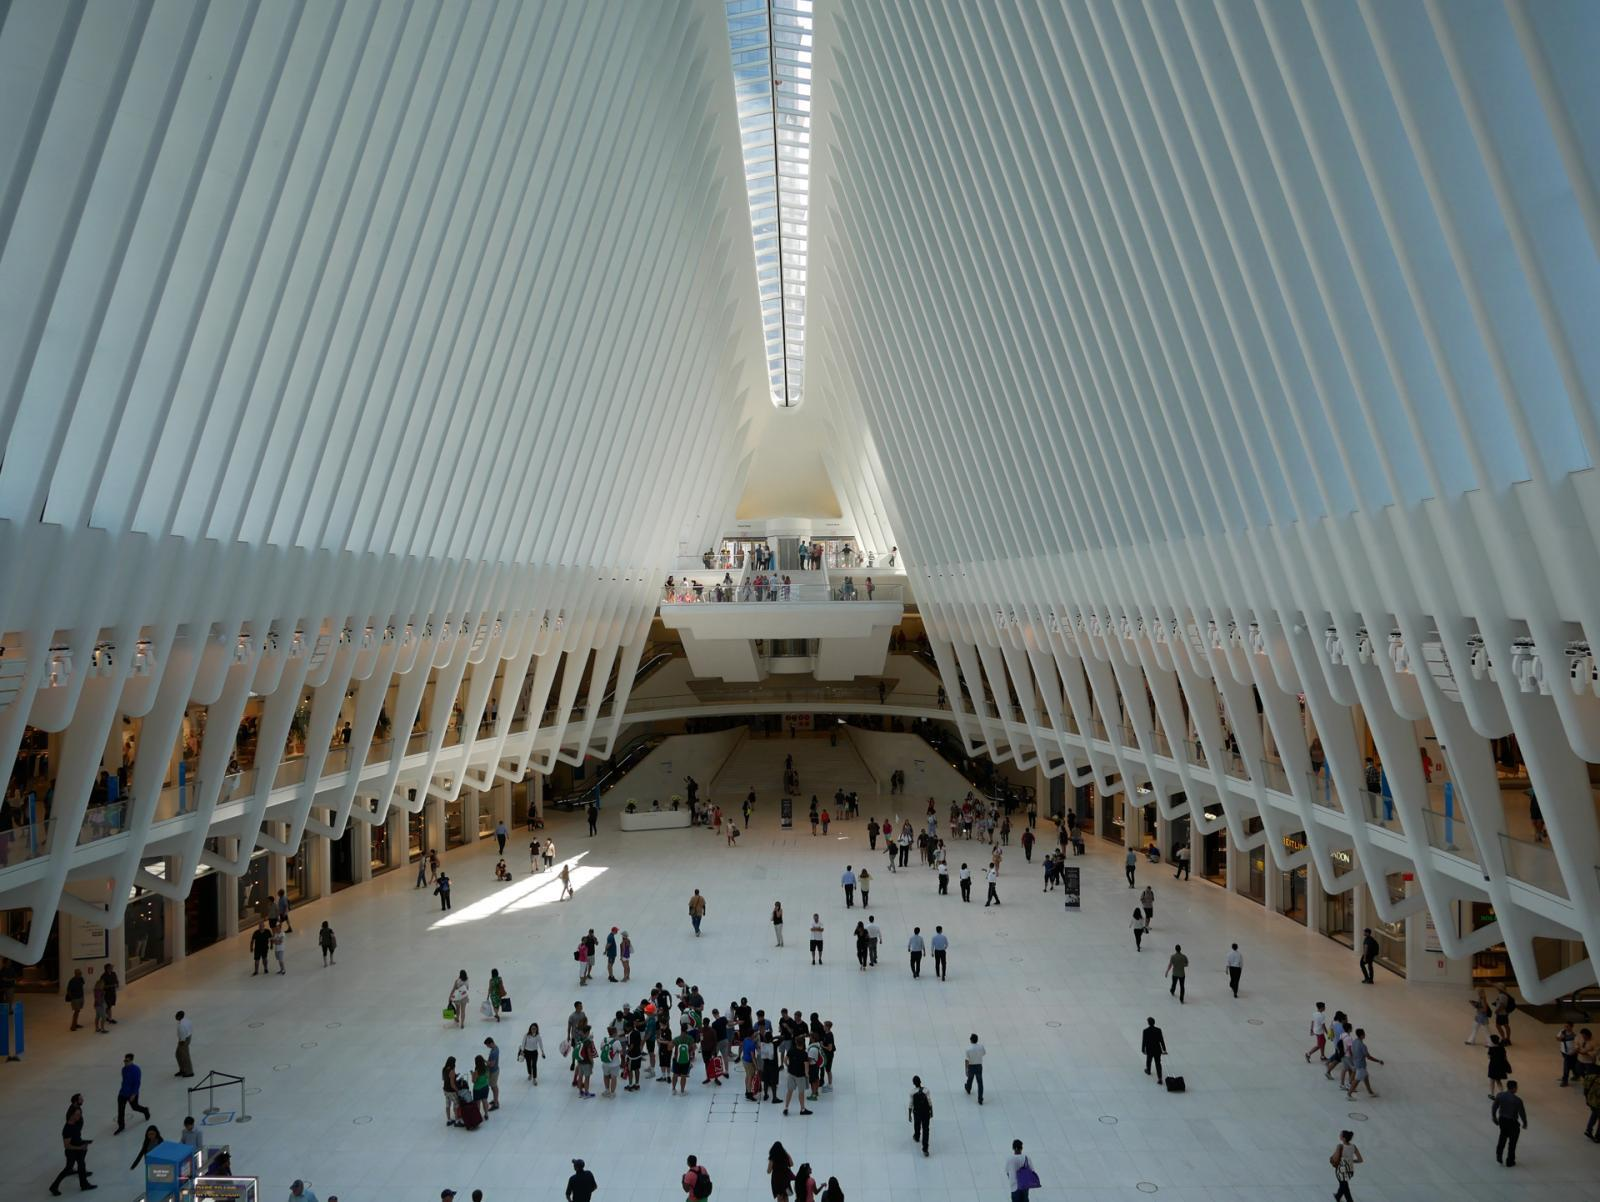 Oculus at Westfield Word Trade Center